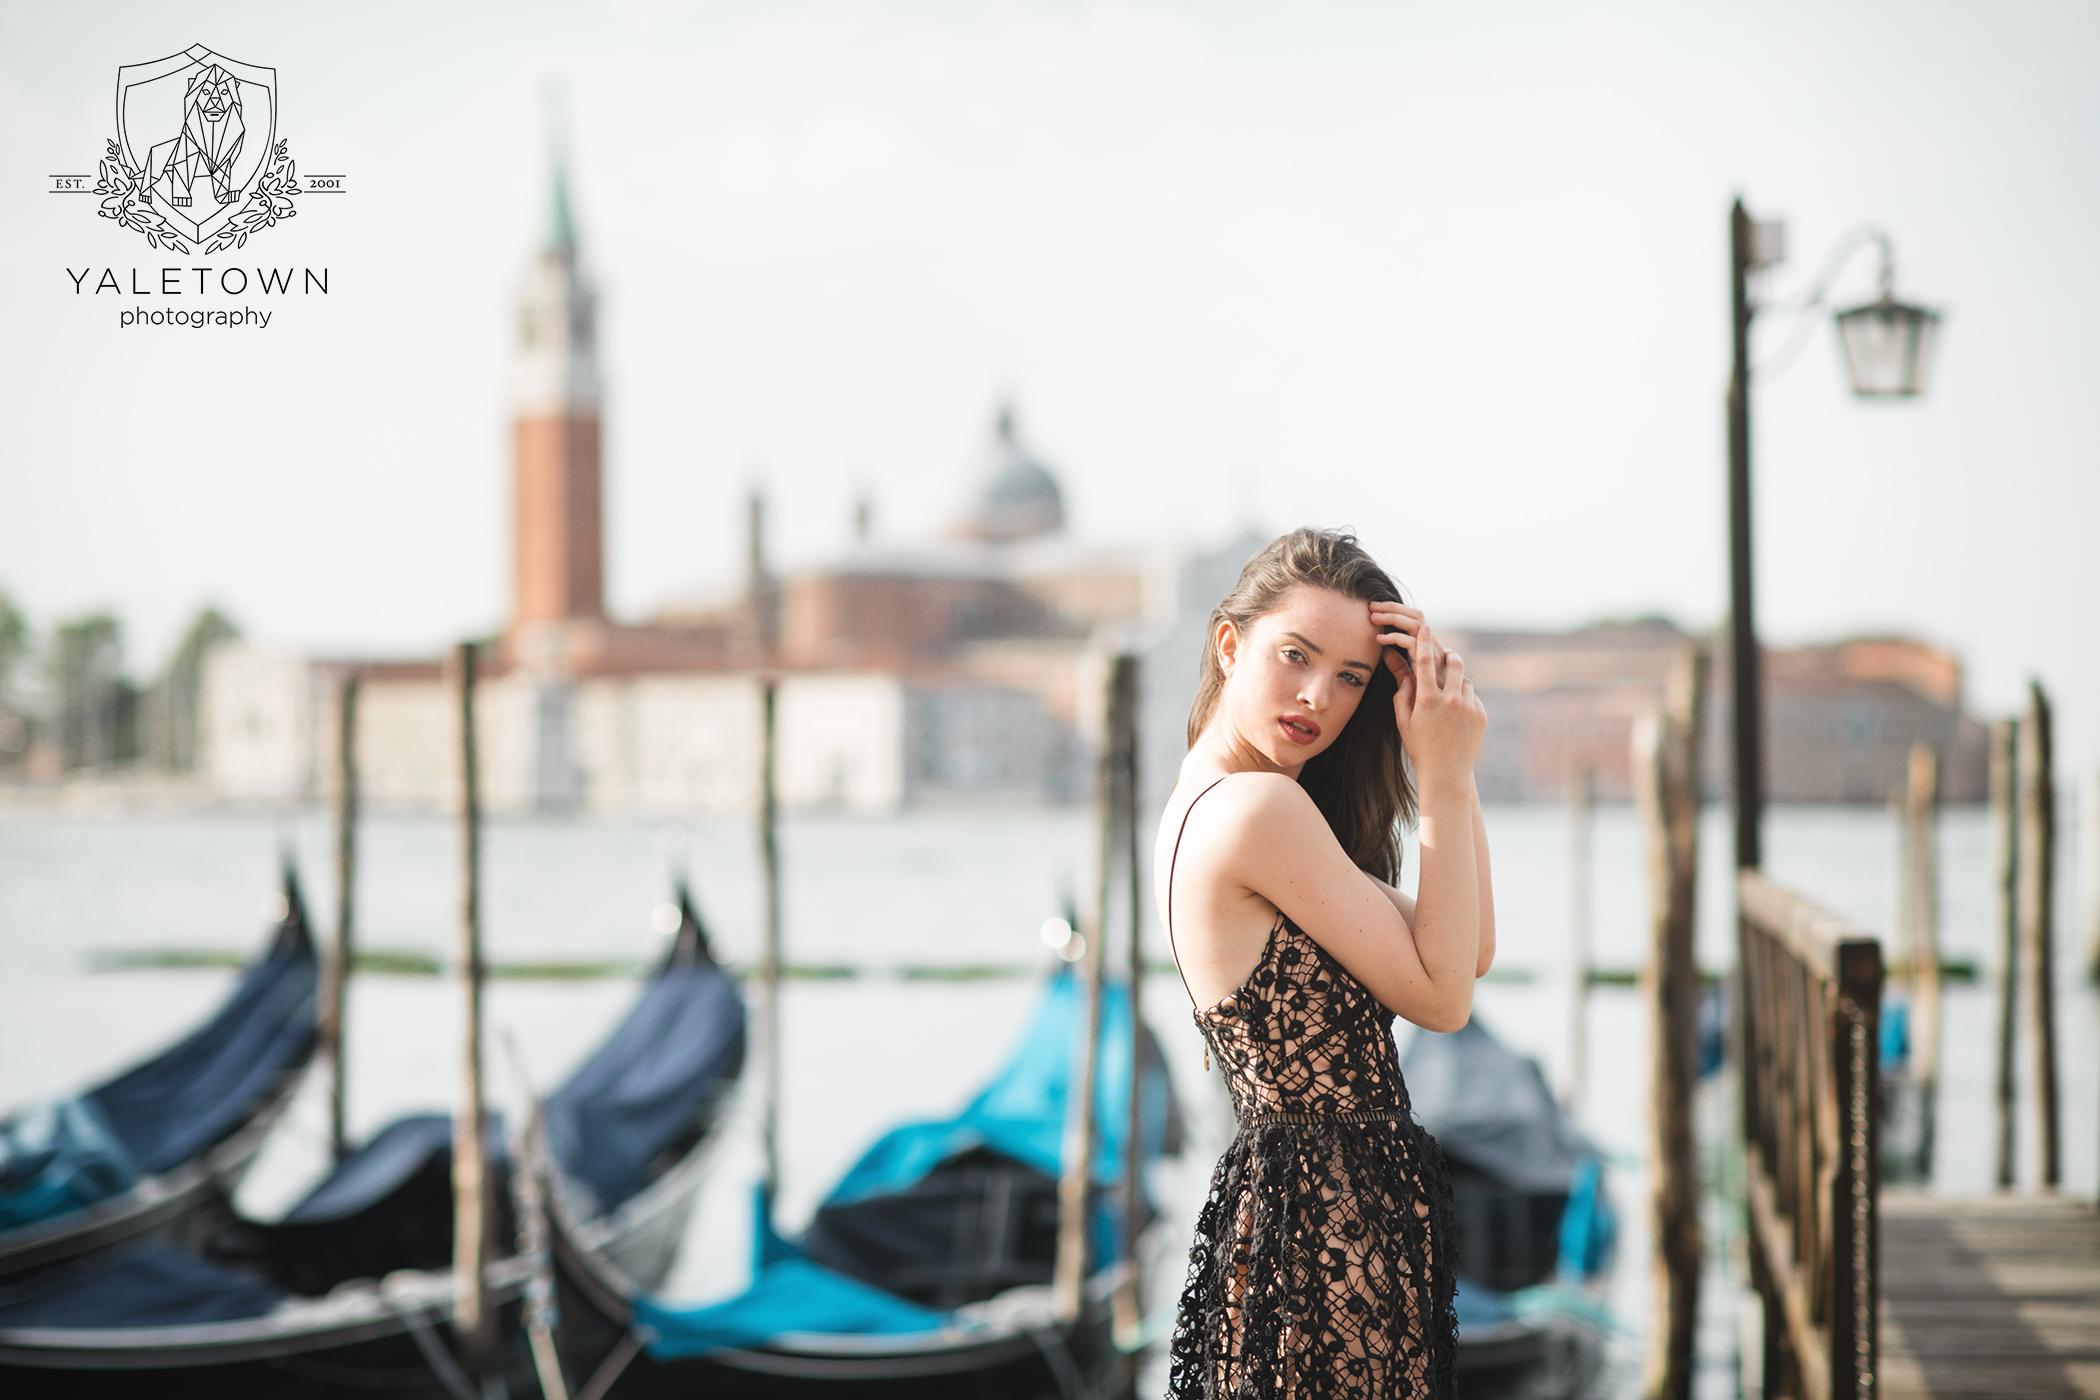 Venice-portrait-session-yaletown-photography-vacation-photographer-photo-013.jpg